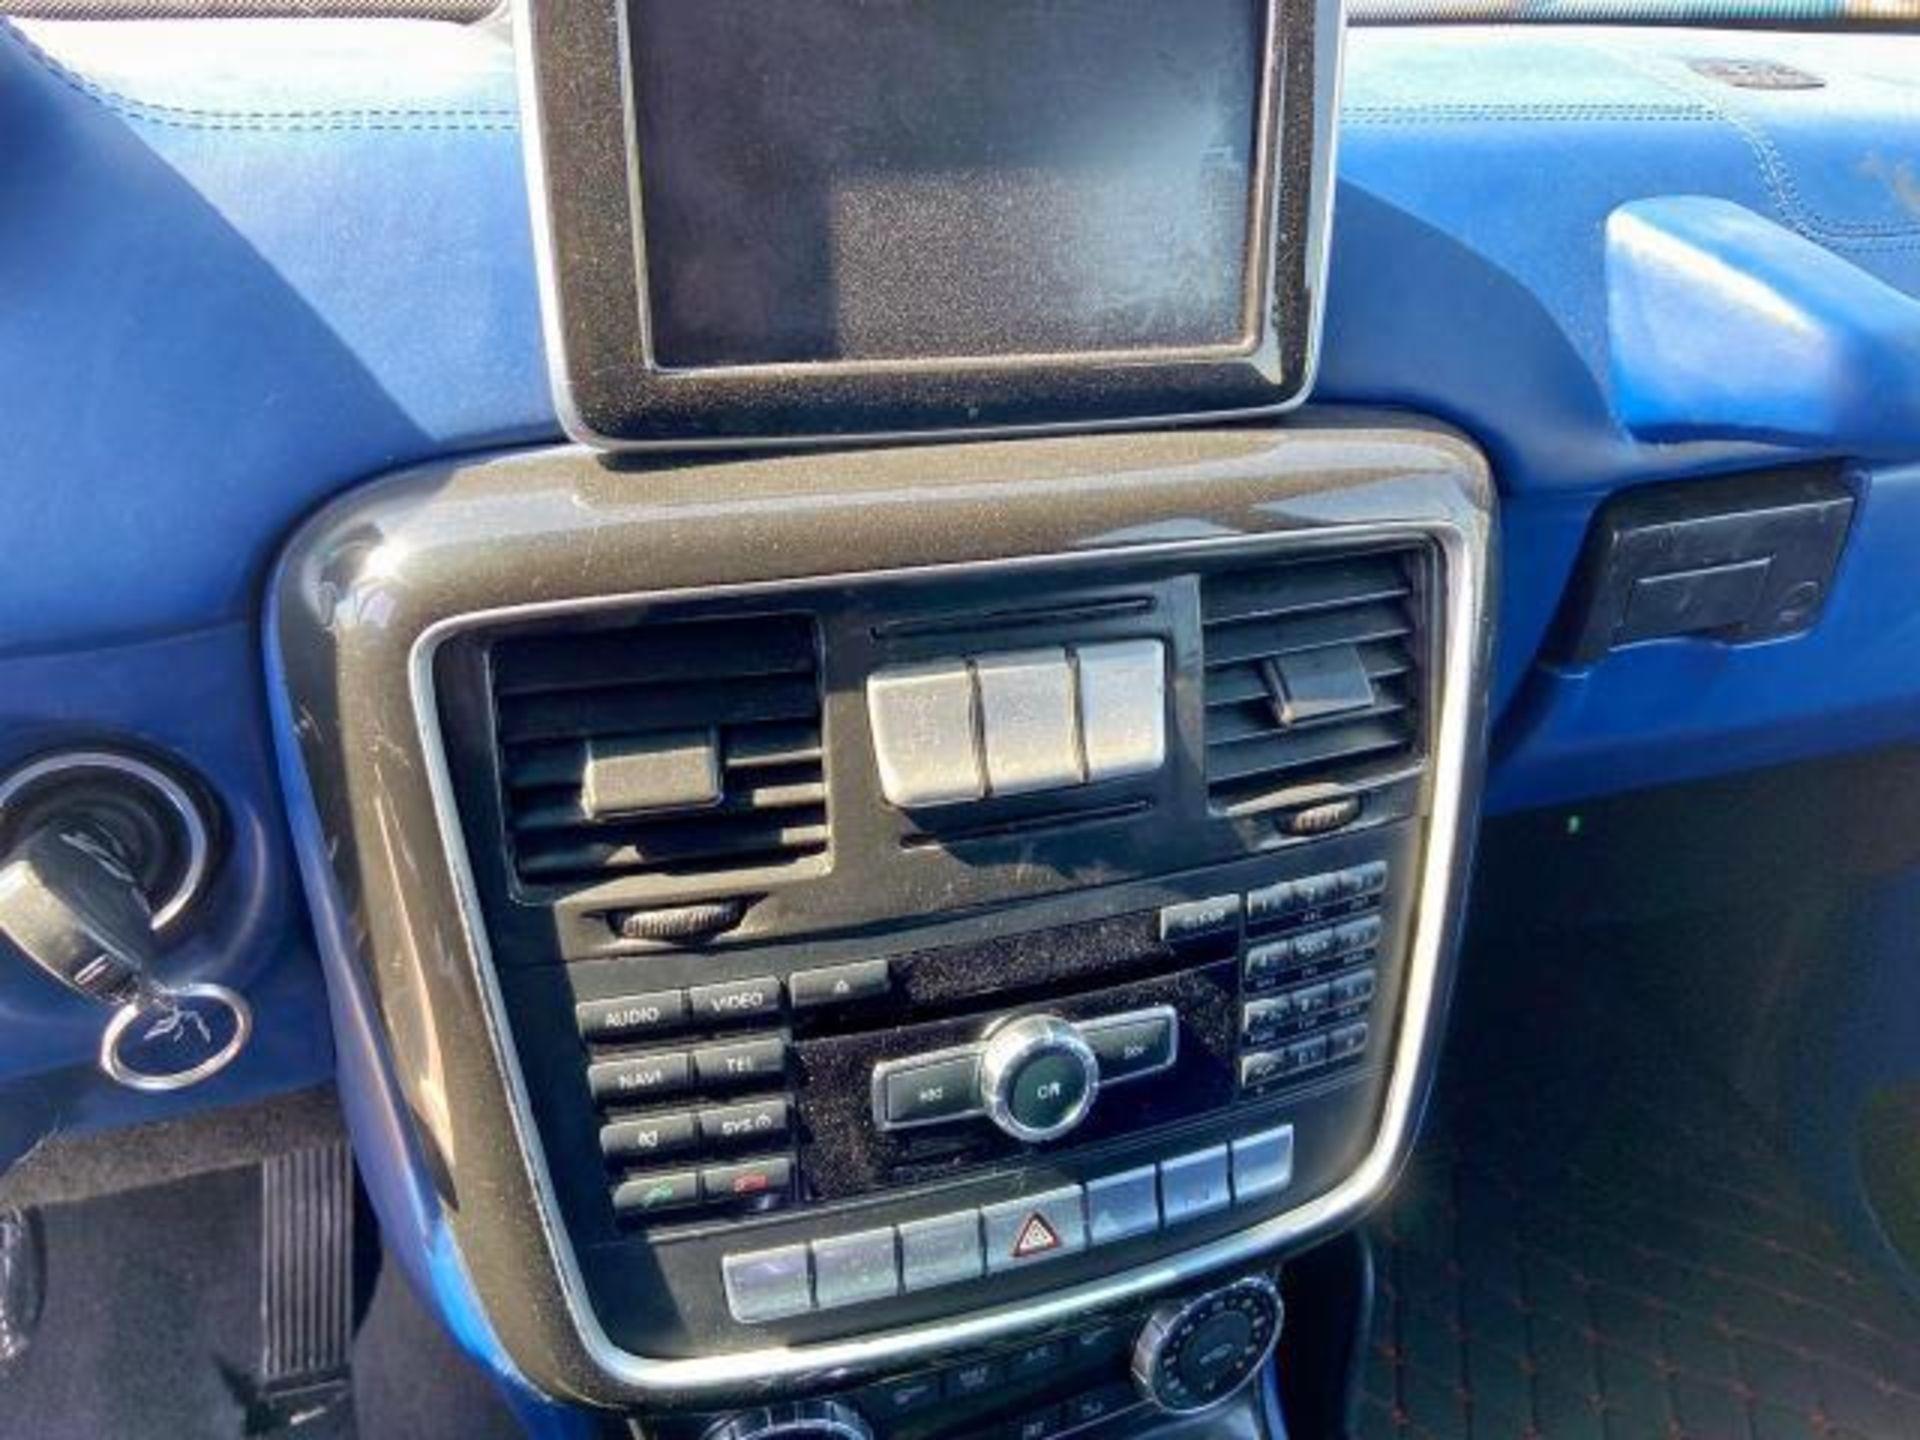 Lot 5B - 1999 MERCEDES BENZ G WAGON G500 V8 PETROL LHD, CURRENTLY ON DUABI PLATES *PLUS VAT*